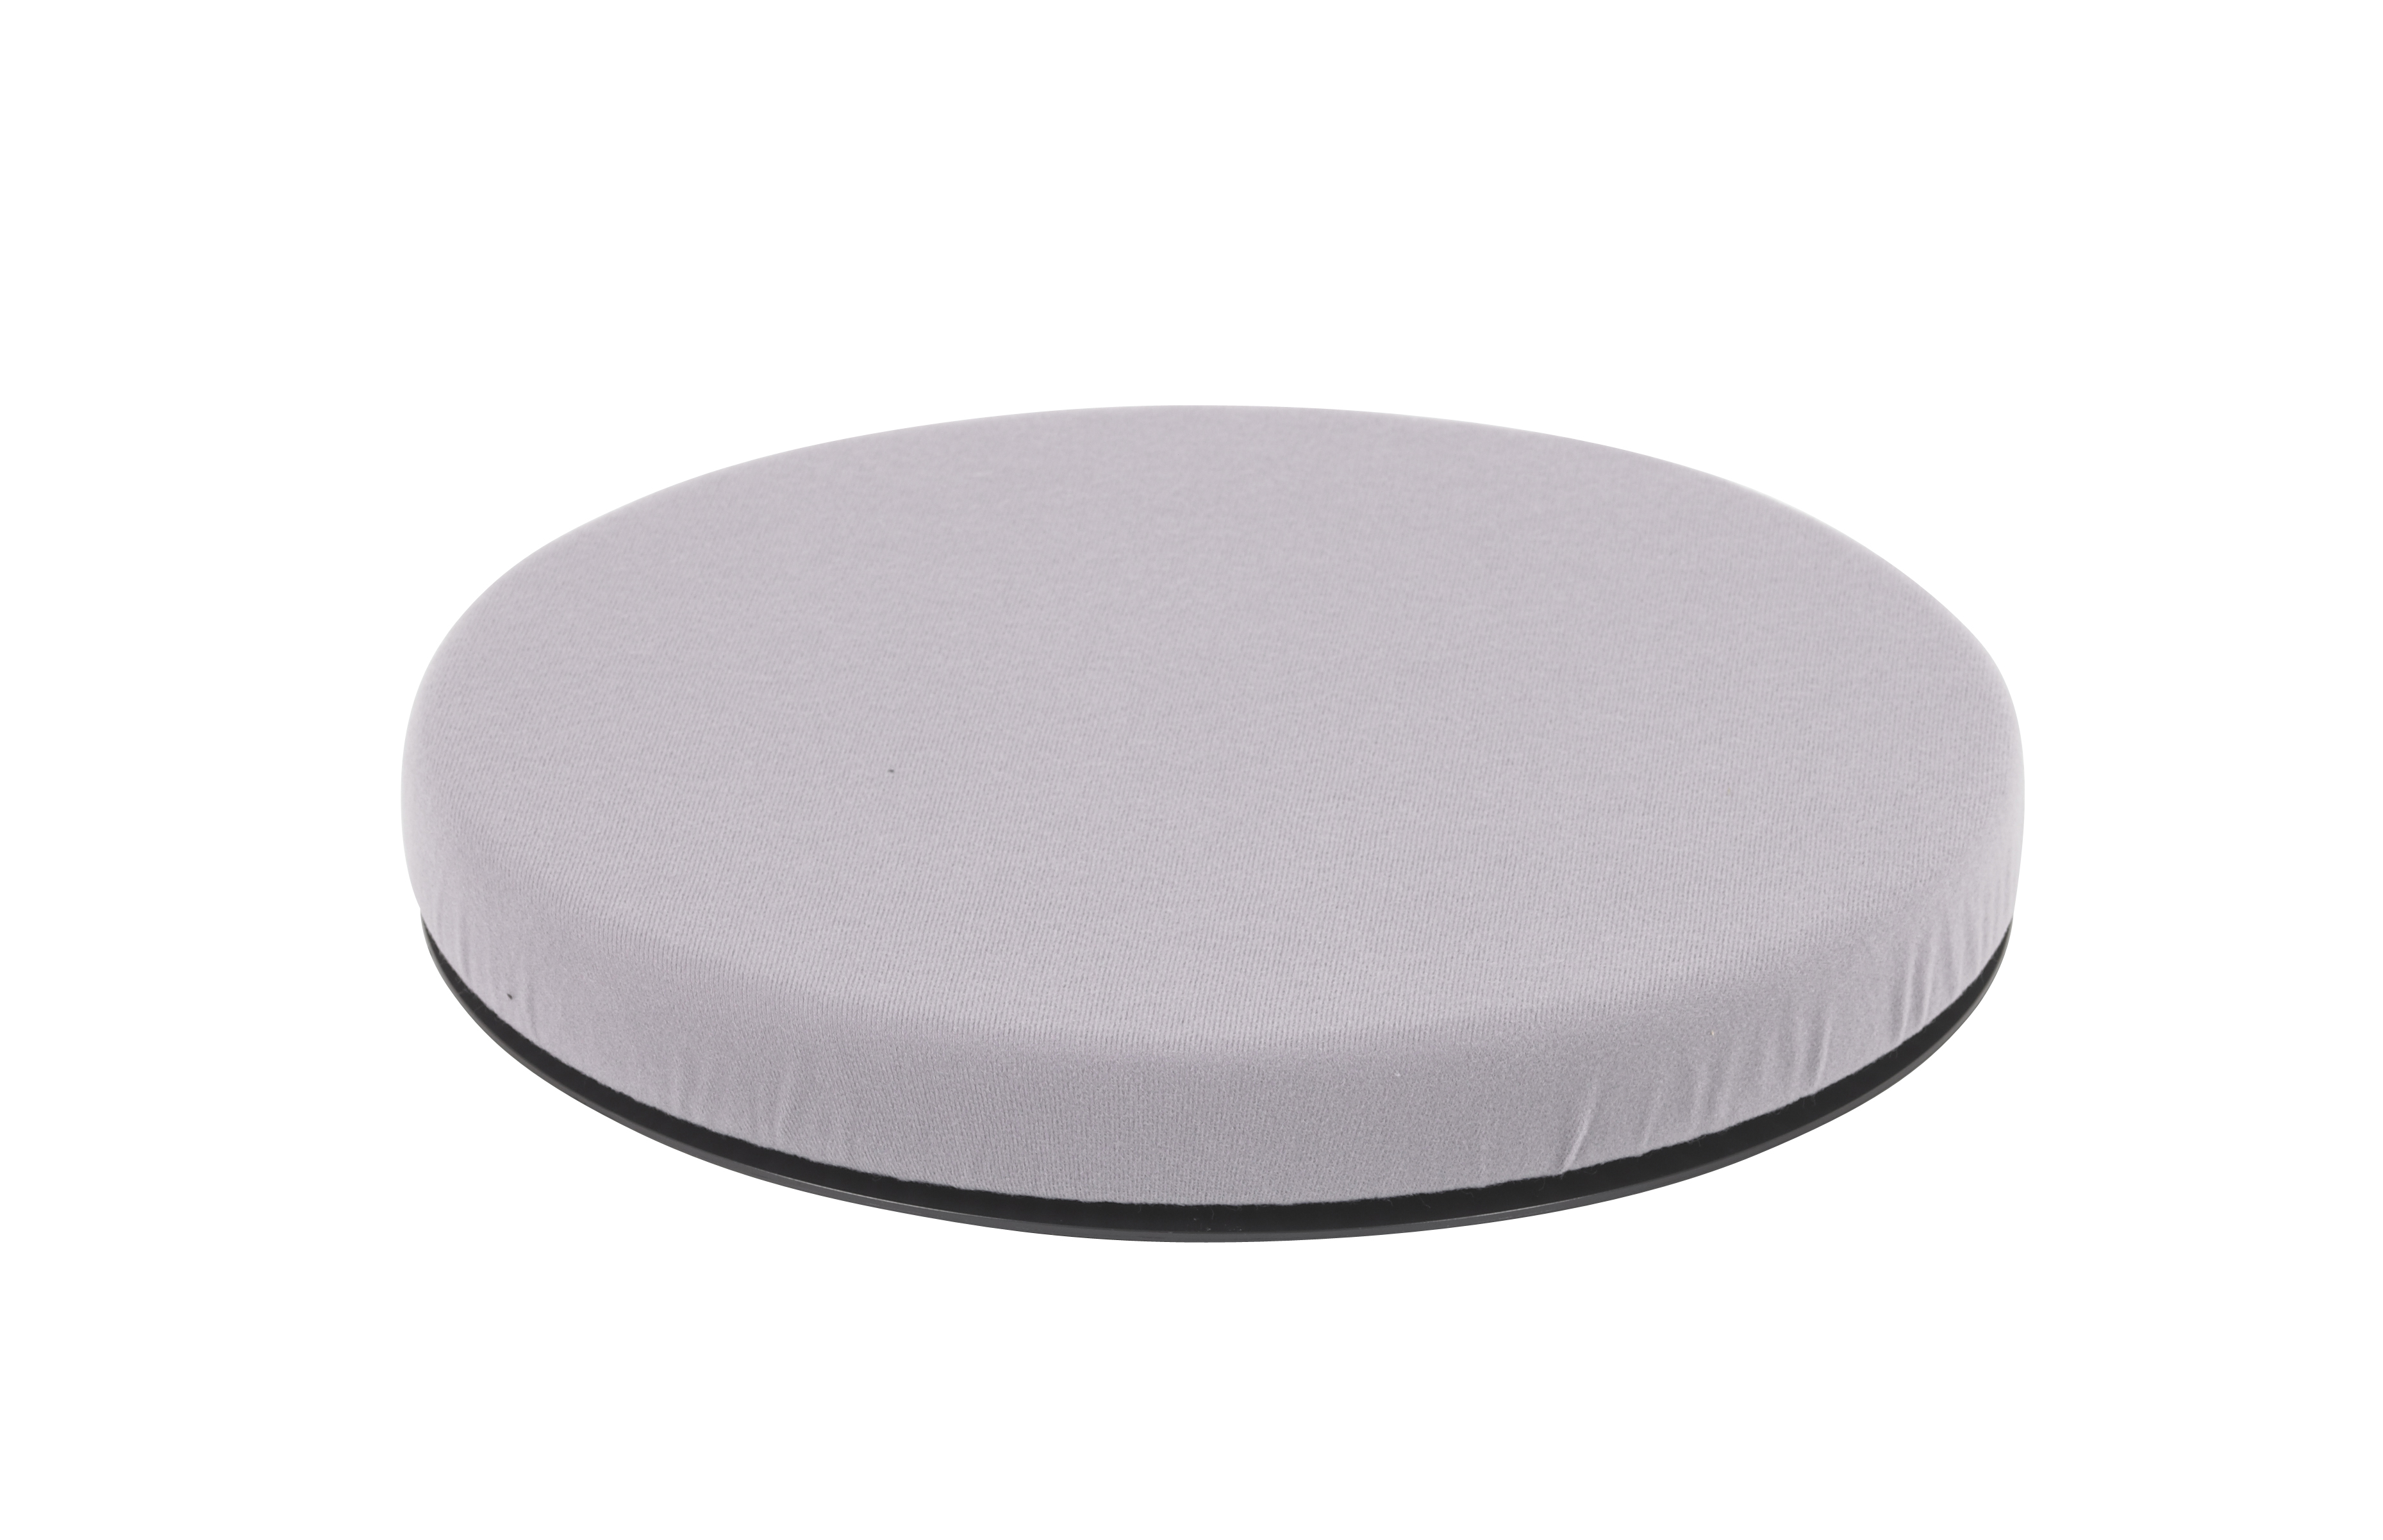 DMI Deluxe Swivel Seat Cushion Ivory